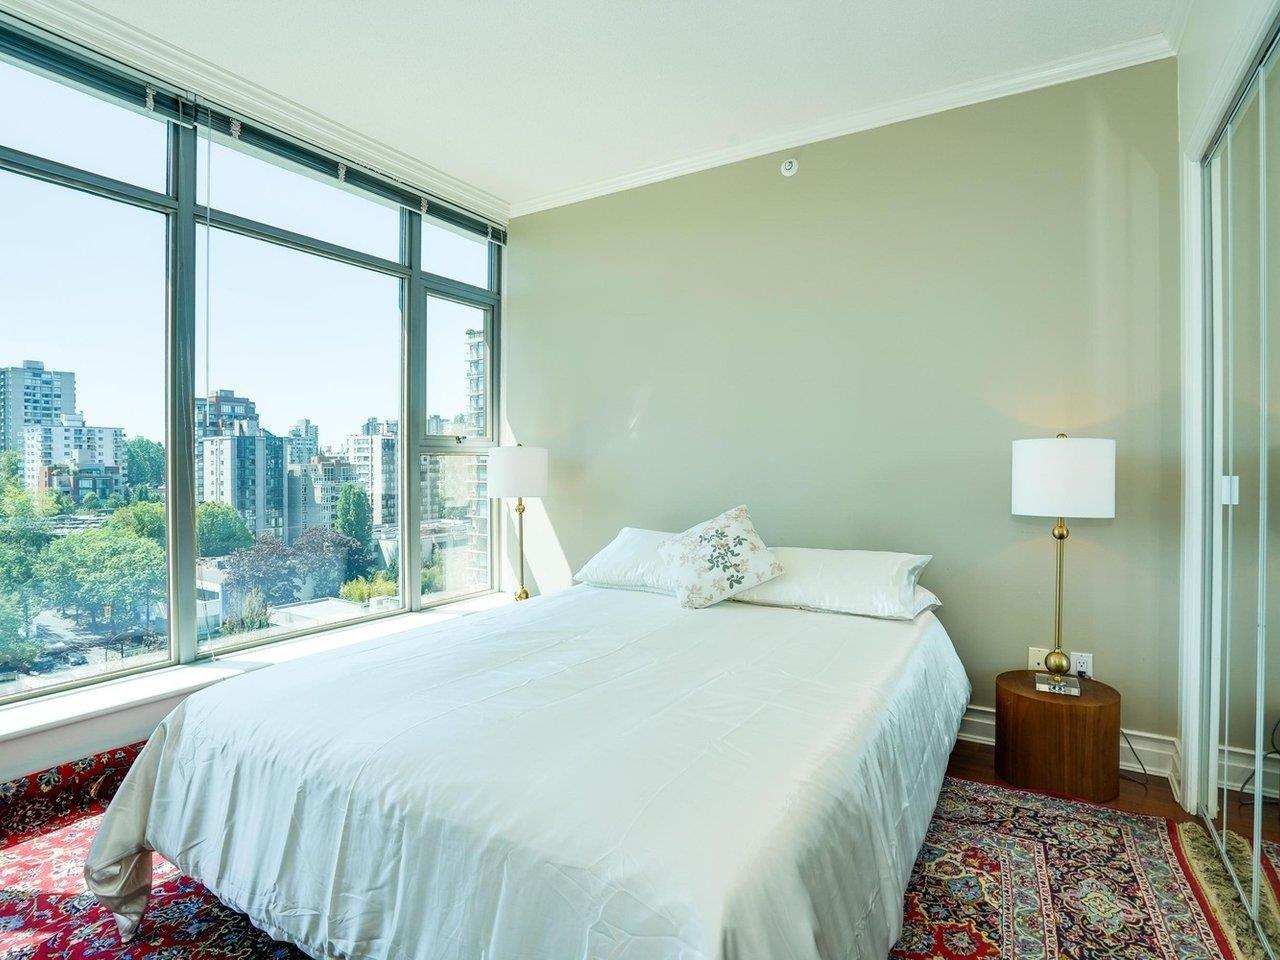 1003 1790 BAYSHORE DRIVE - Coal Harbour Apartment/Condo for sale, 1 Bedroom (R2606481) - #15